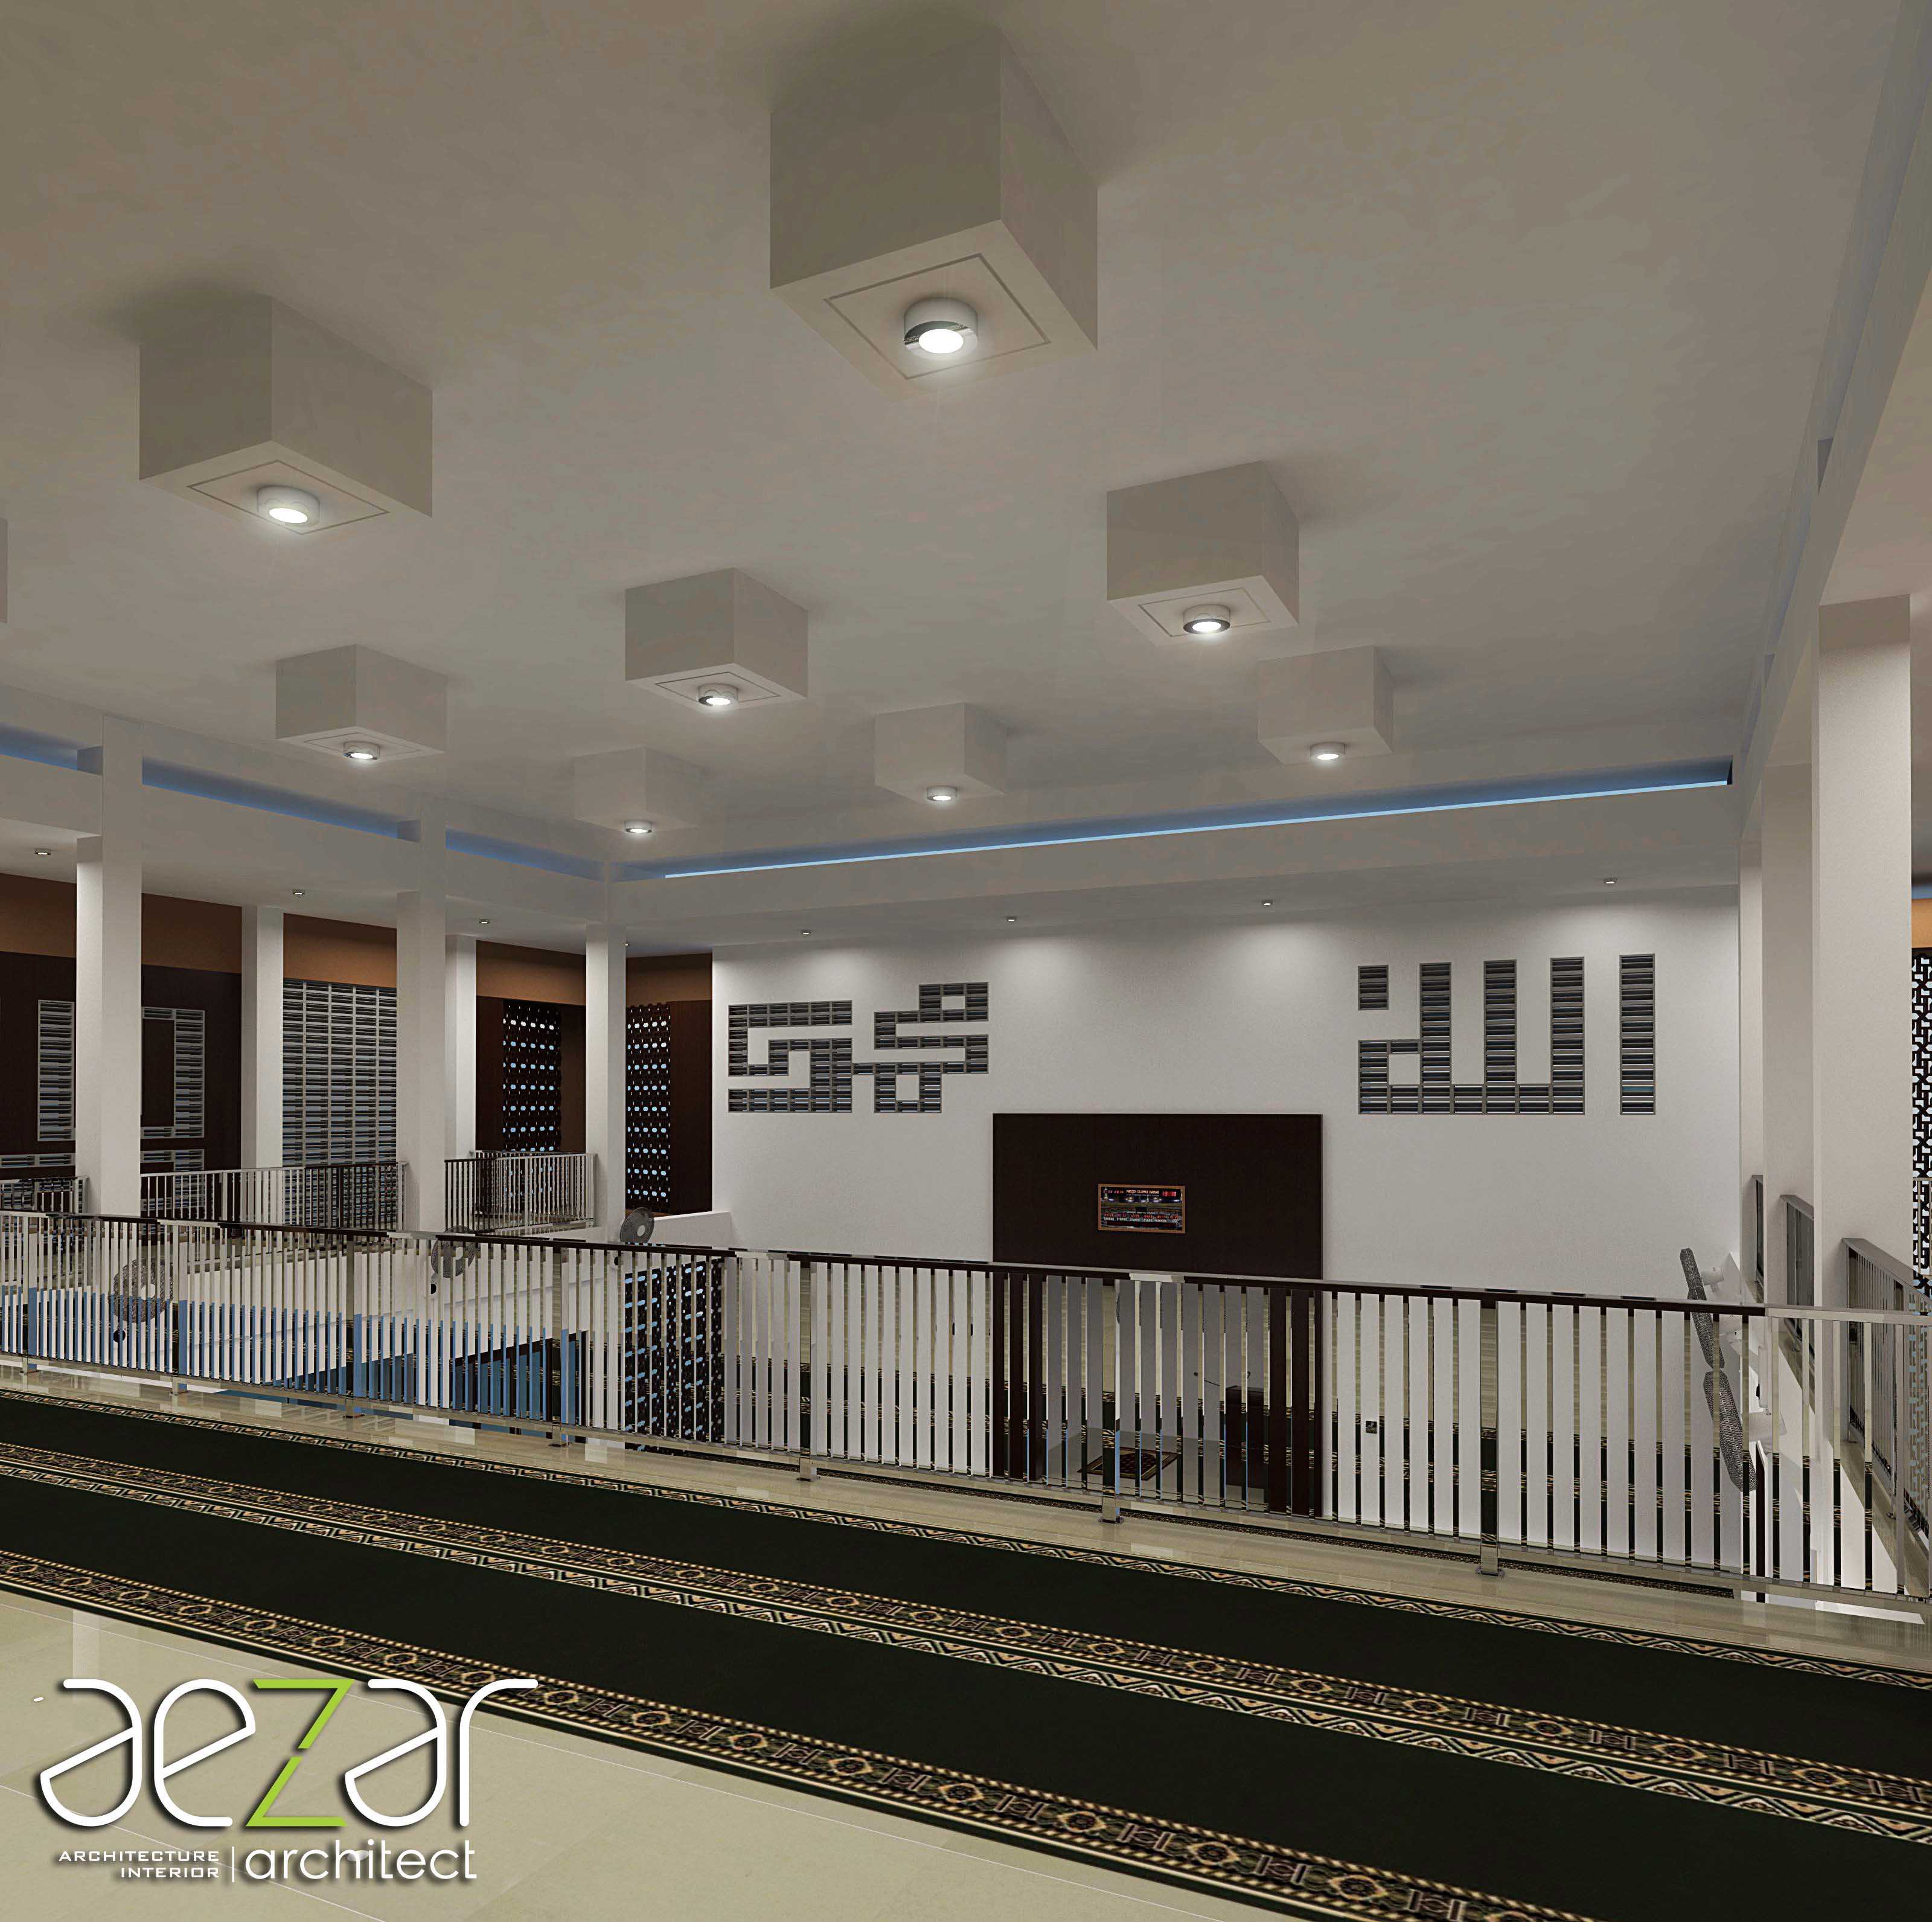 Aezar Architect Masjid Hasyim Asy'ari Kabupaten Cilacap, Jawa Tengah, Indonesia Kabupaten Cilacap, Jawa Tengah, Indonesia Interior View   54444